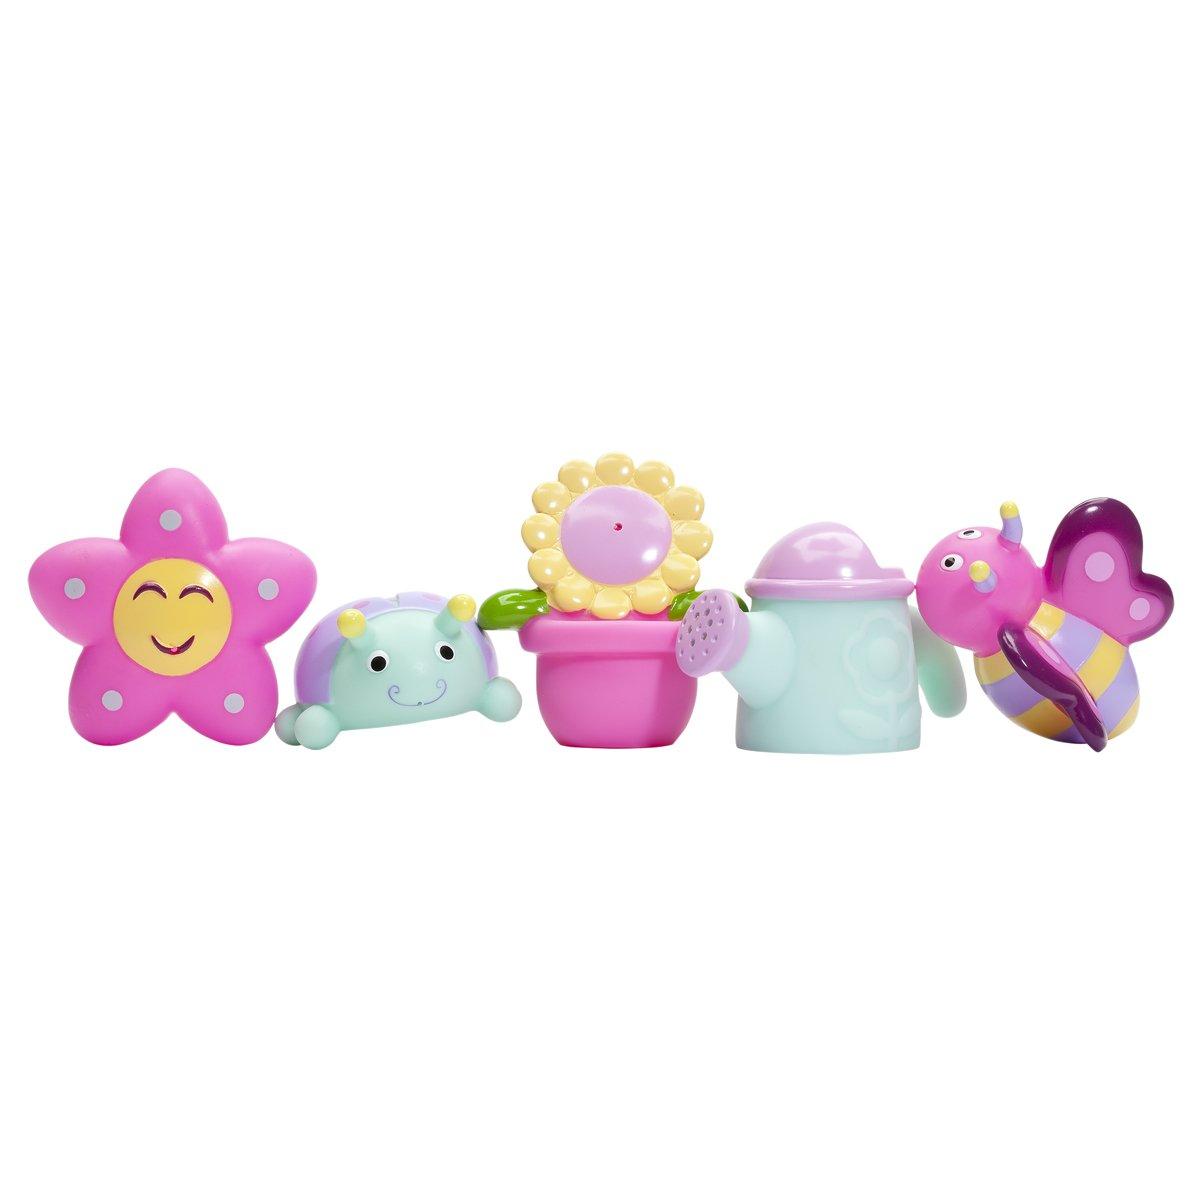 Amazon.com : Elegant Baby Bath Time Fun Rubber Water Squirtie Toys ...